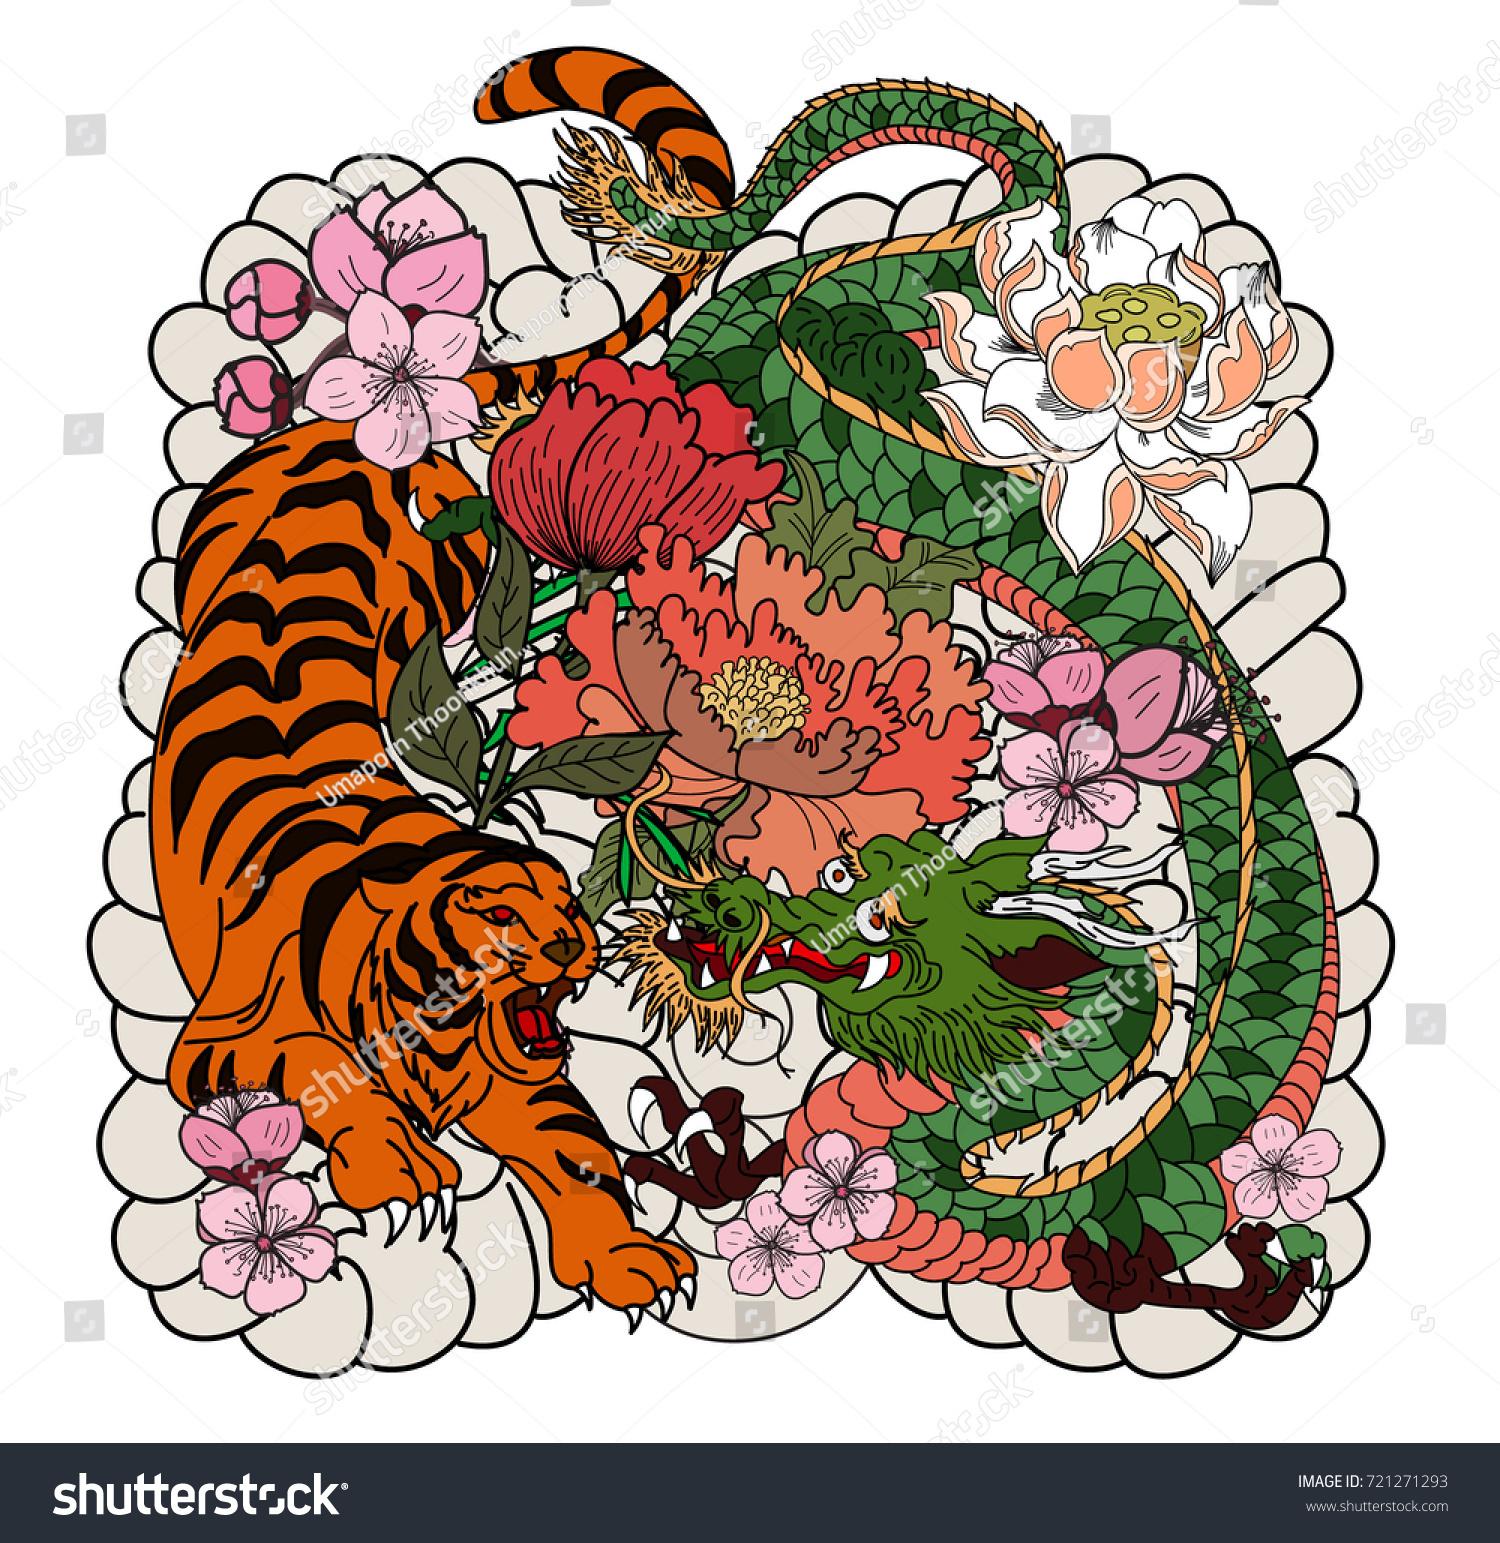 Tiger dragon fighting tattoo japanese style dragon stock vector tiger and dragon fighting tattoojapanese style dragon with tiger and peony flower on cloud izmirmasajfo